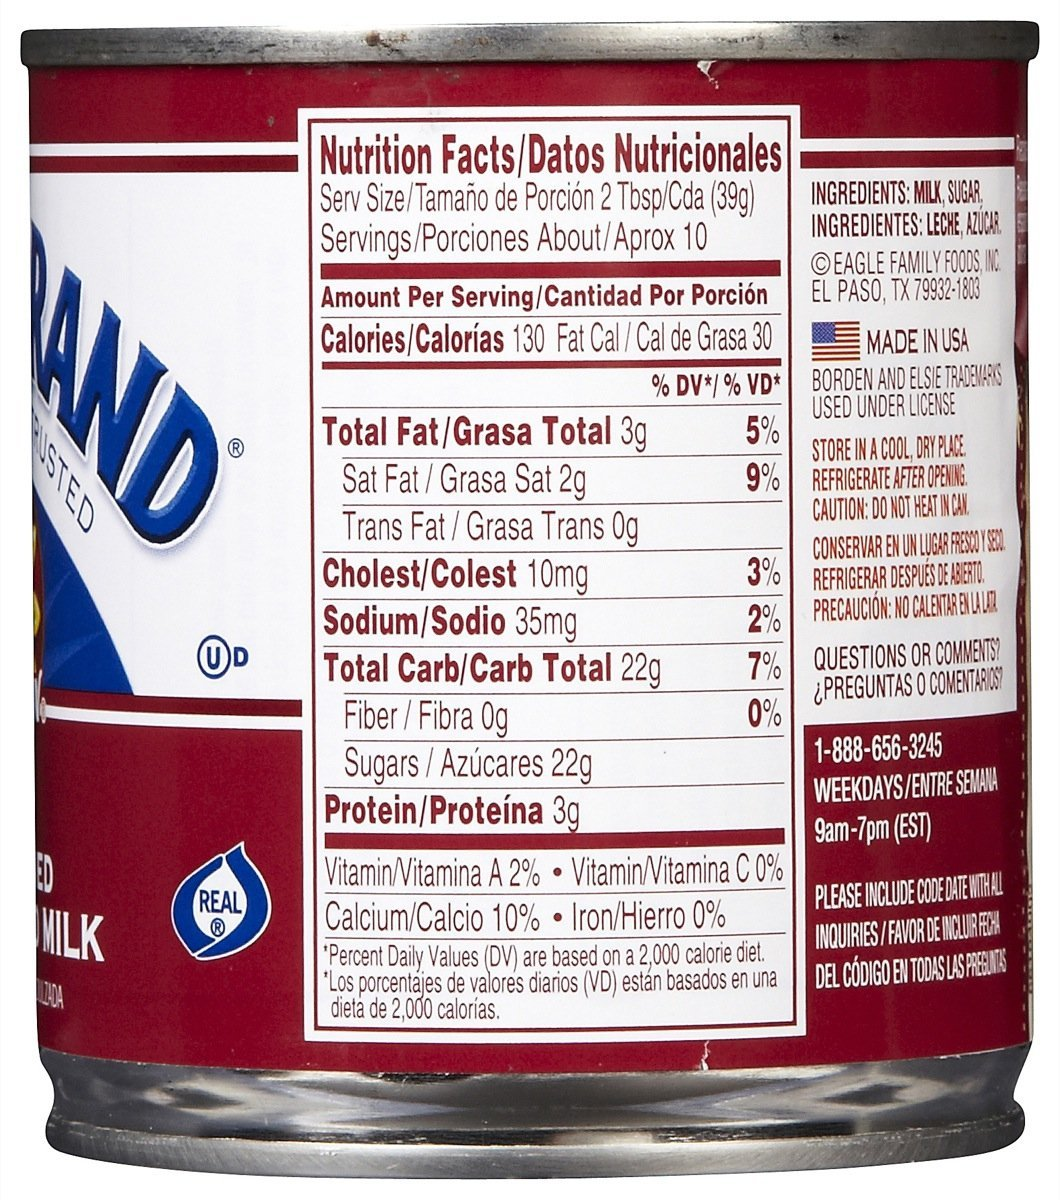 Amazon.com : Eagle Brand Sweetened Condensed Milk - 14 oz - 3 pk : Grocery & Gourmet Food